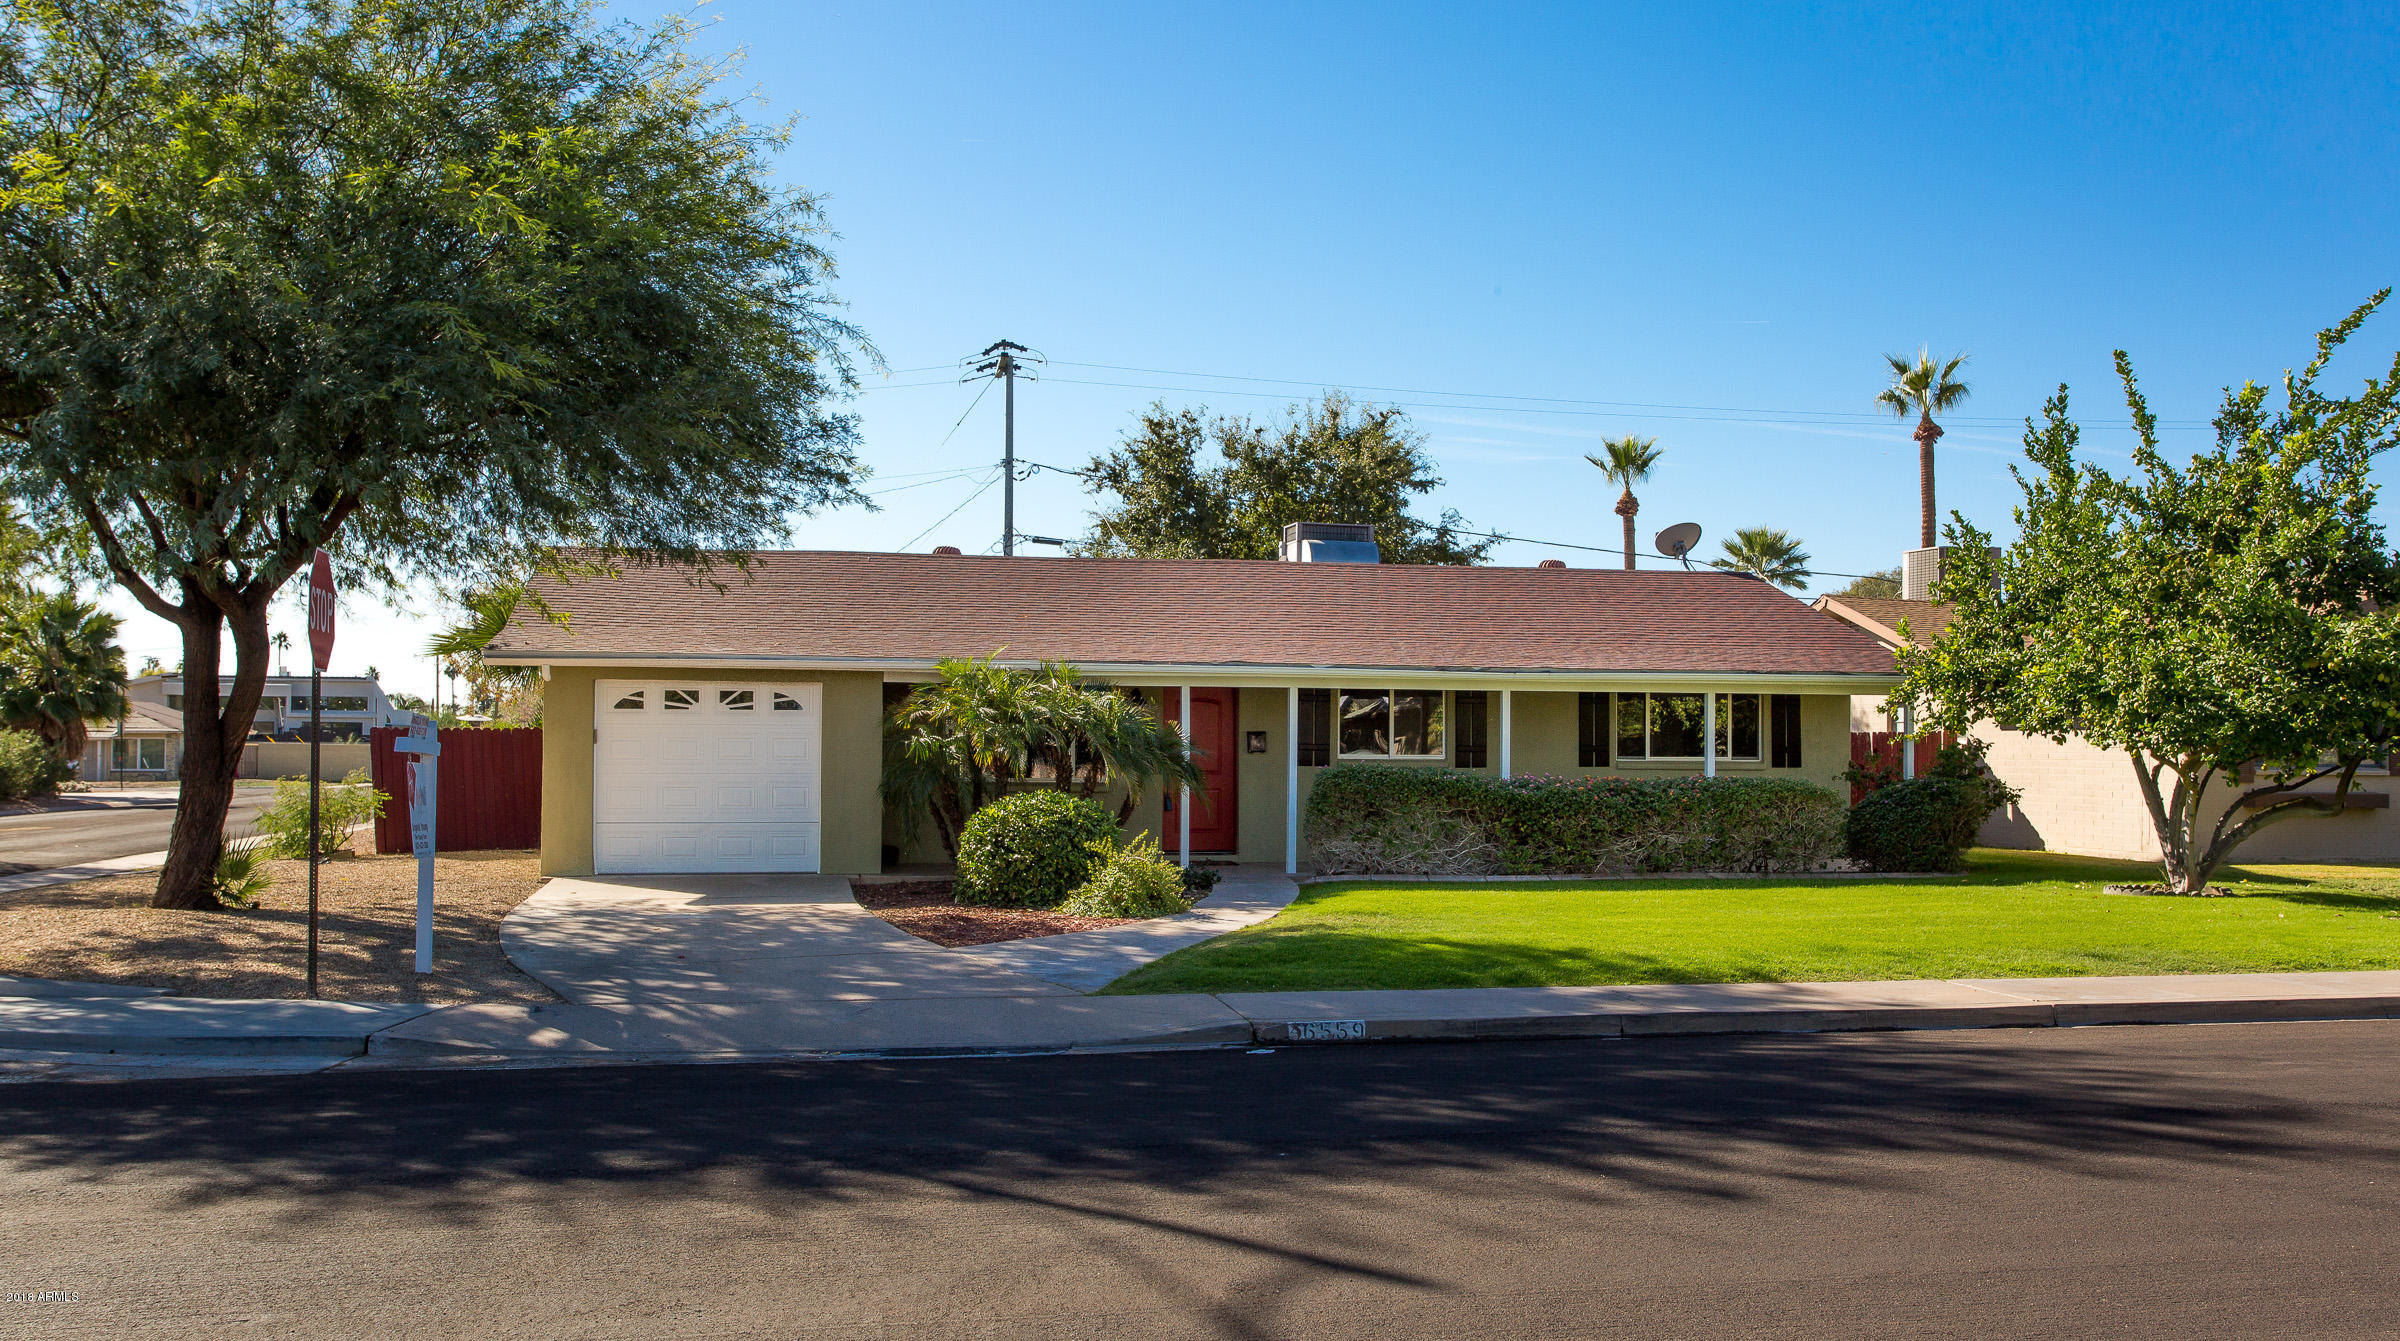 6559 E 2ND Street Scottsdale, AZ 85251 - MLS #: 5831606